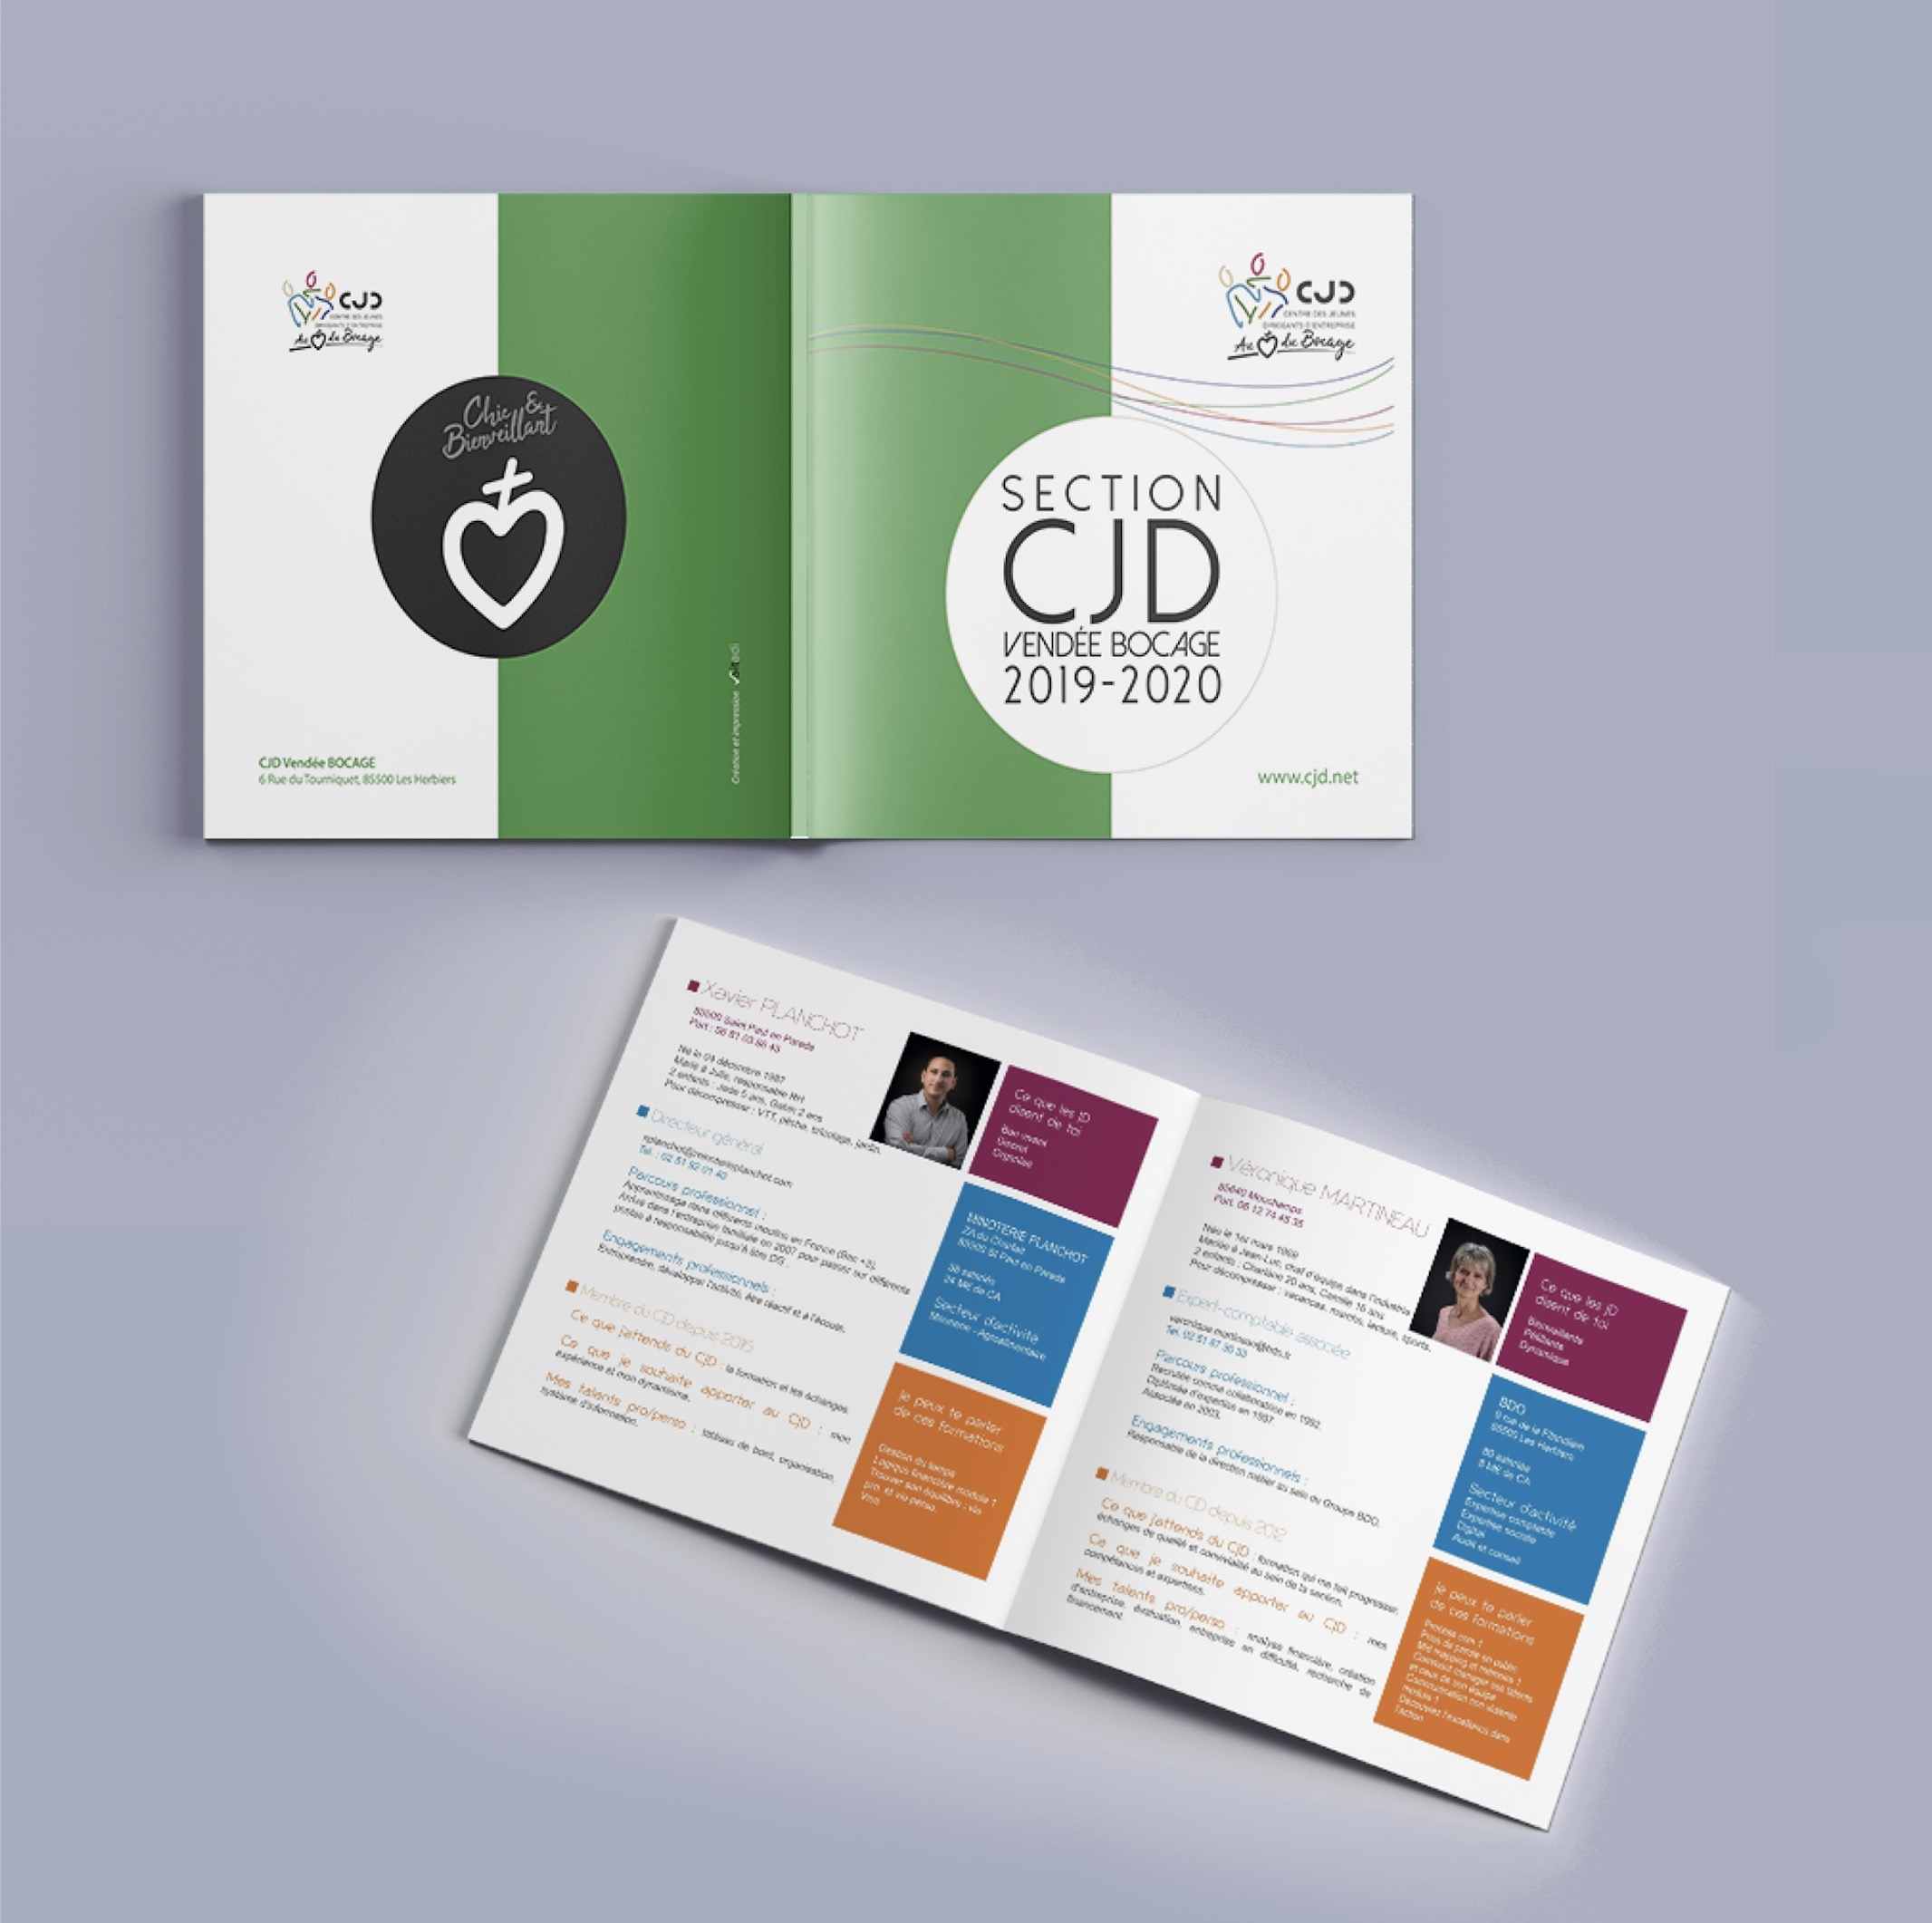 Flyer Sitadi - Annuaire CJD Vendee Bocage 2019-2020